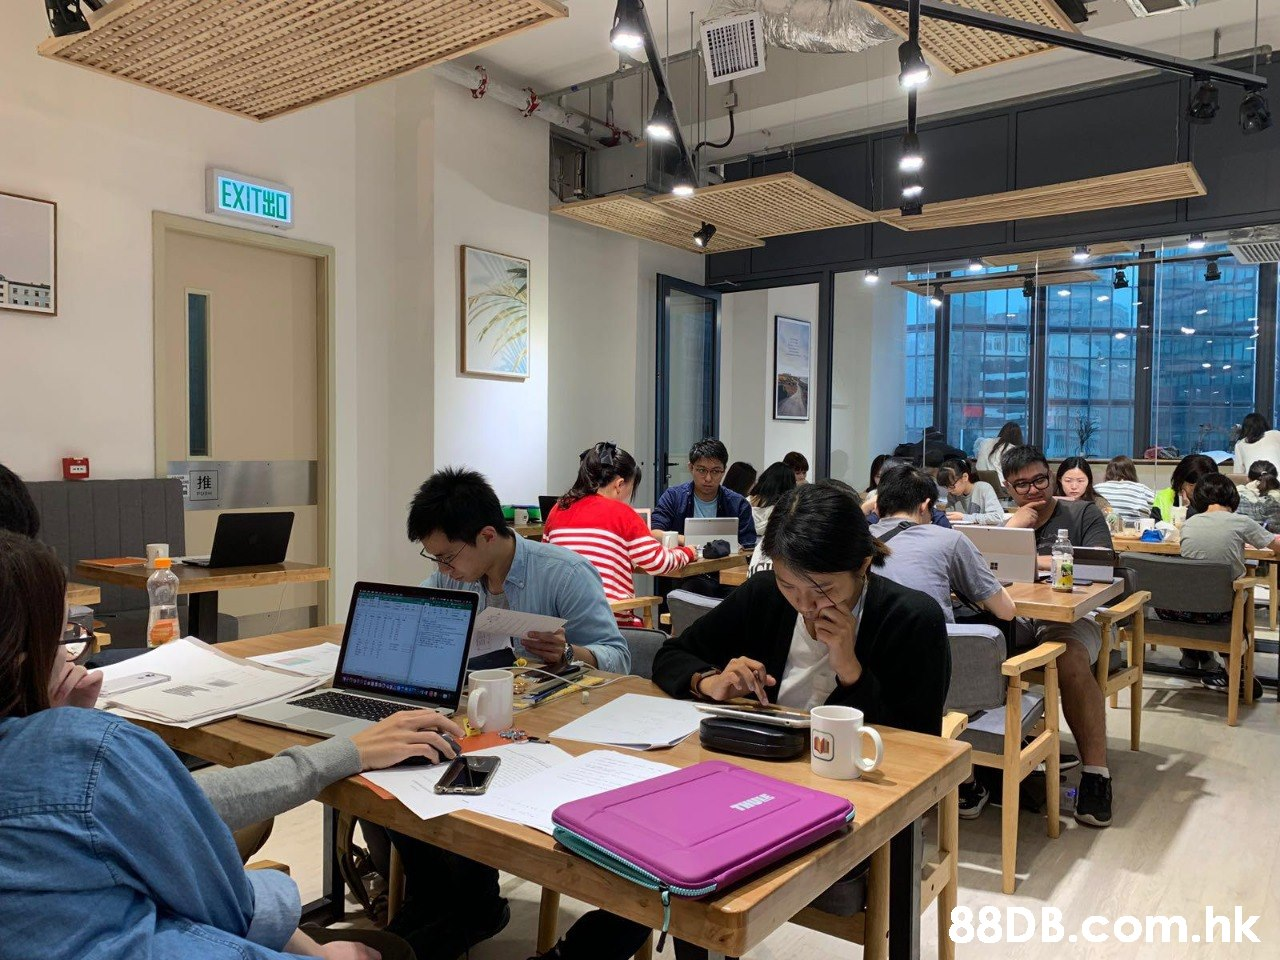 EXIT O 88D B.com.hk,Classroom,Room,Class,Learning,Education